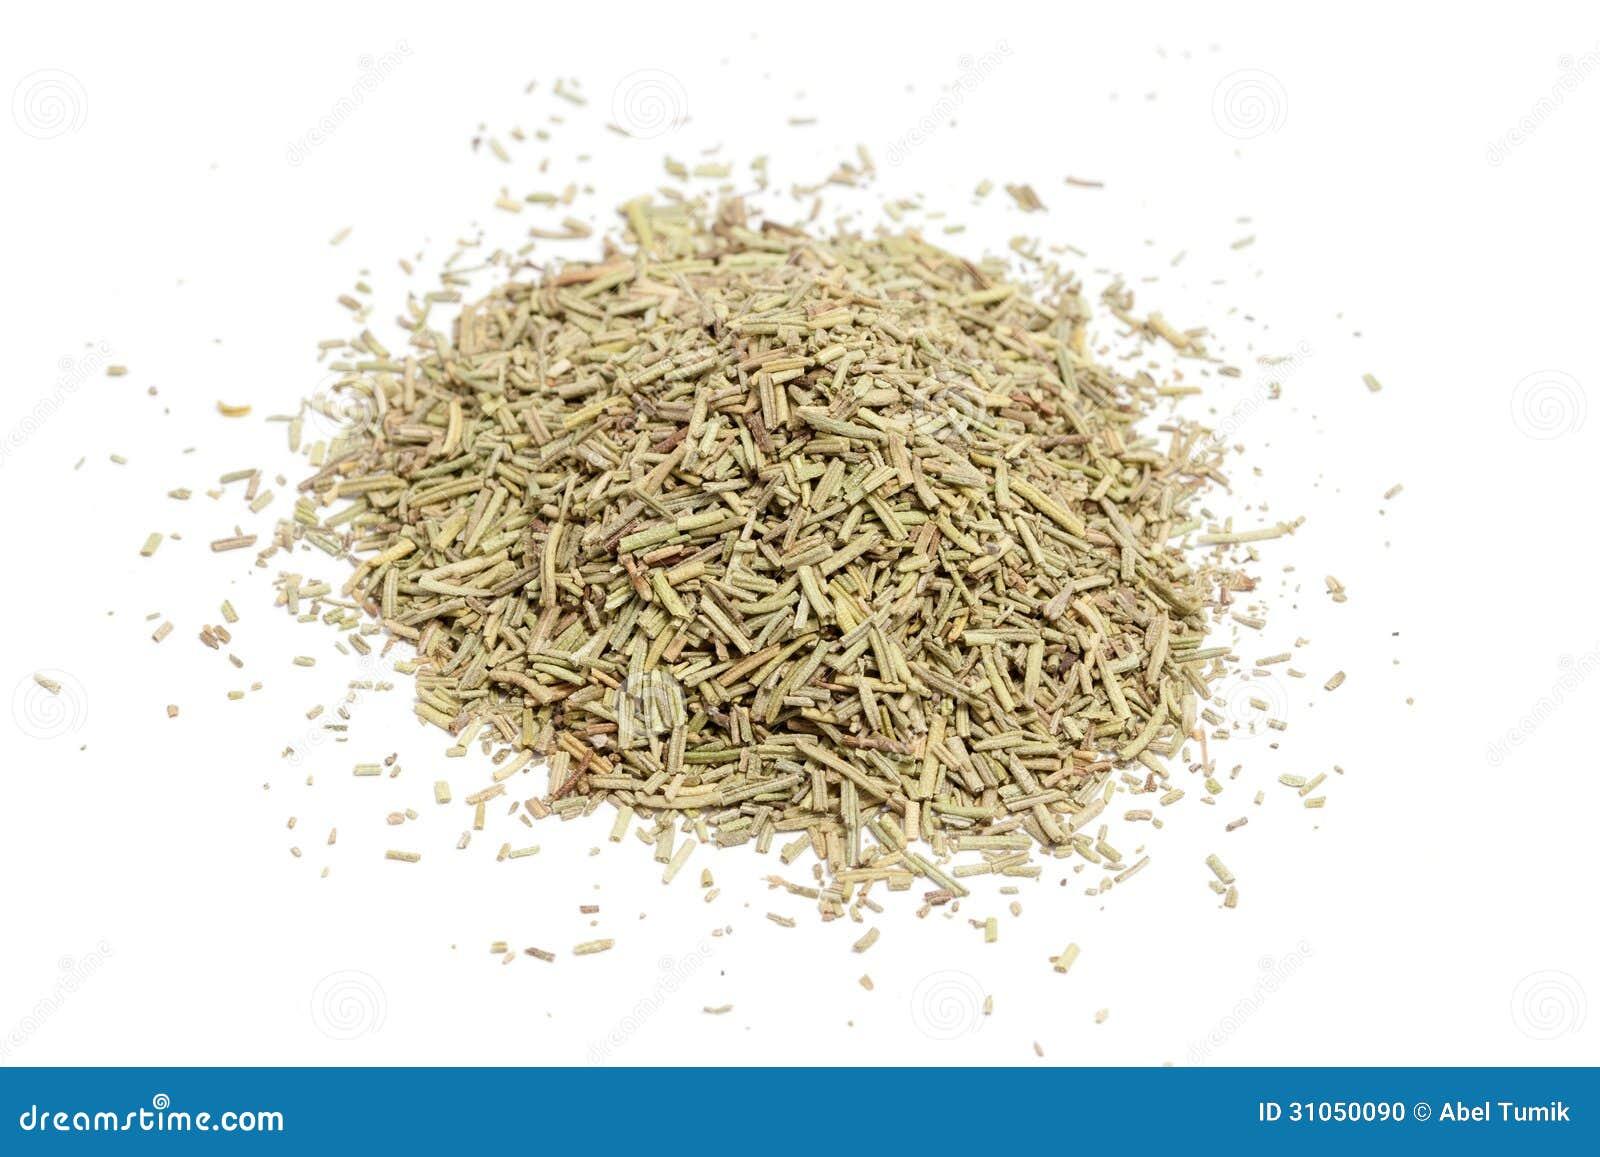 Dried Rosemary Stock Photo - Image: 31050090